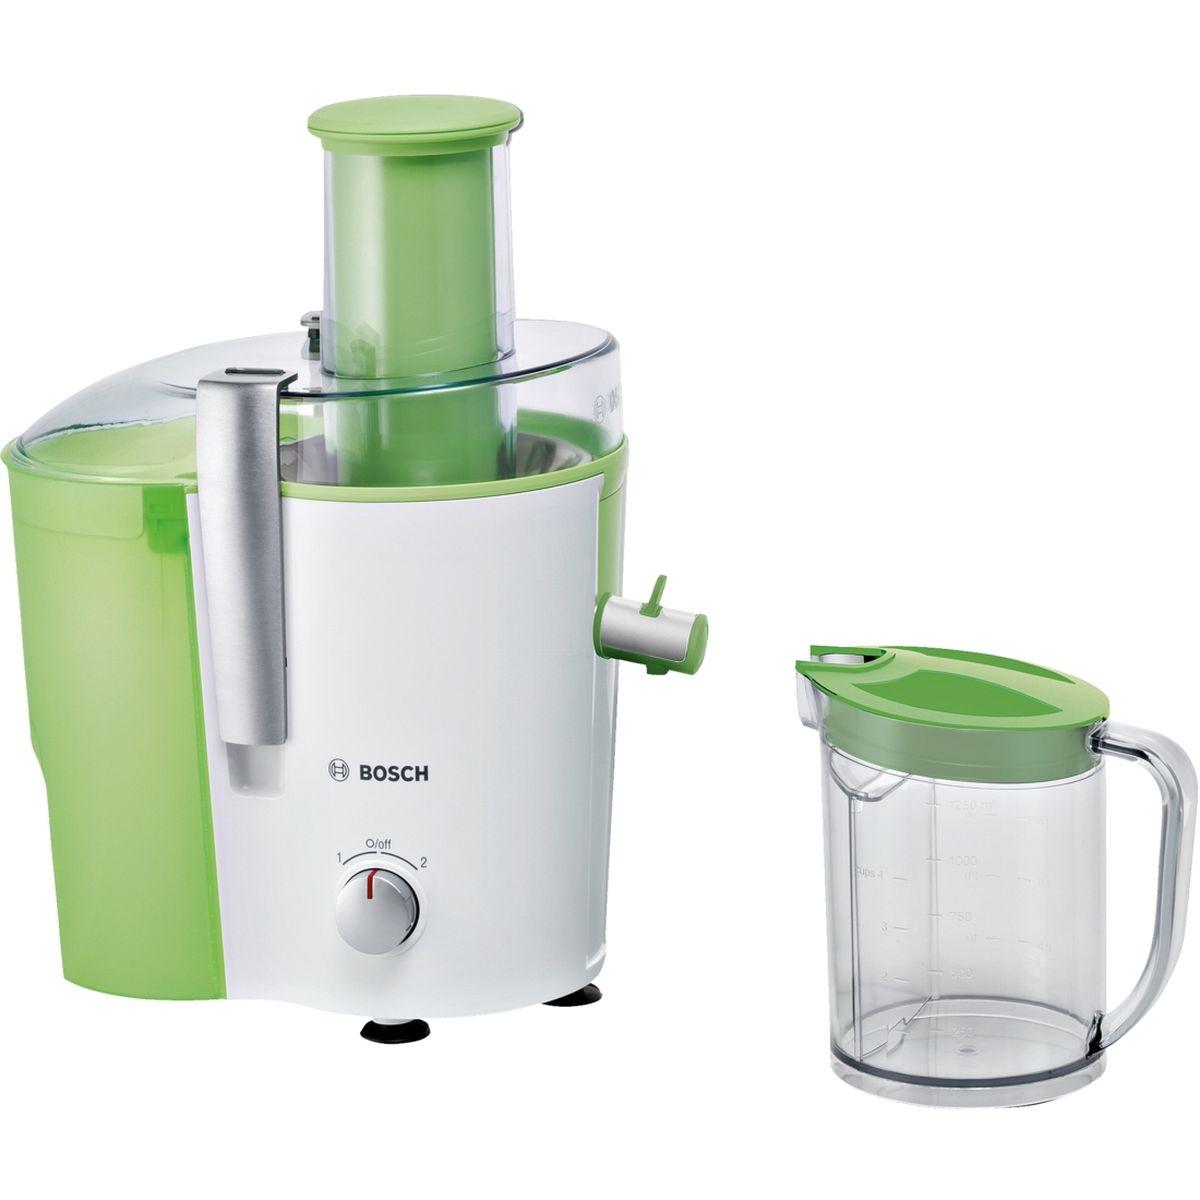 Bosch MES25G0, White Green соковыжималка